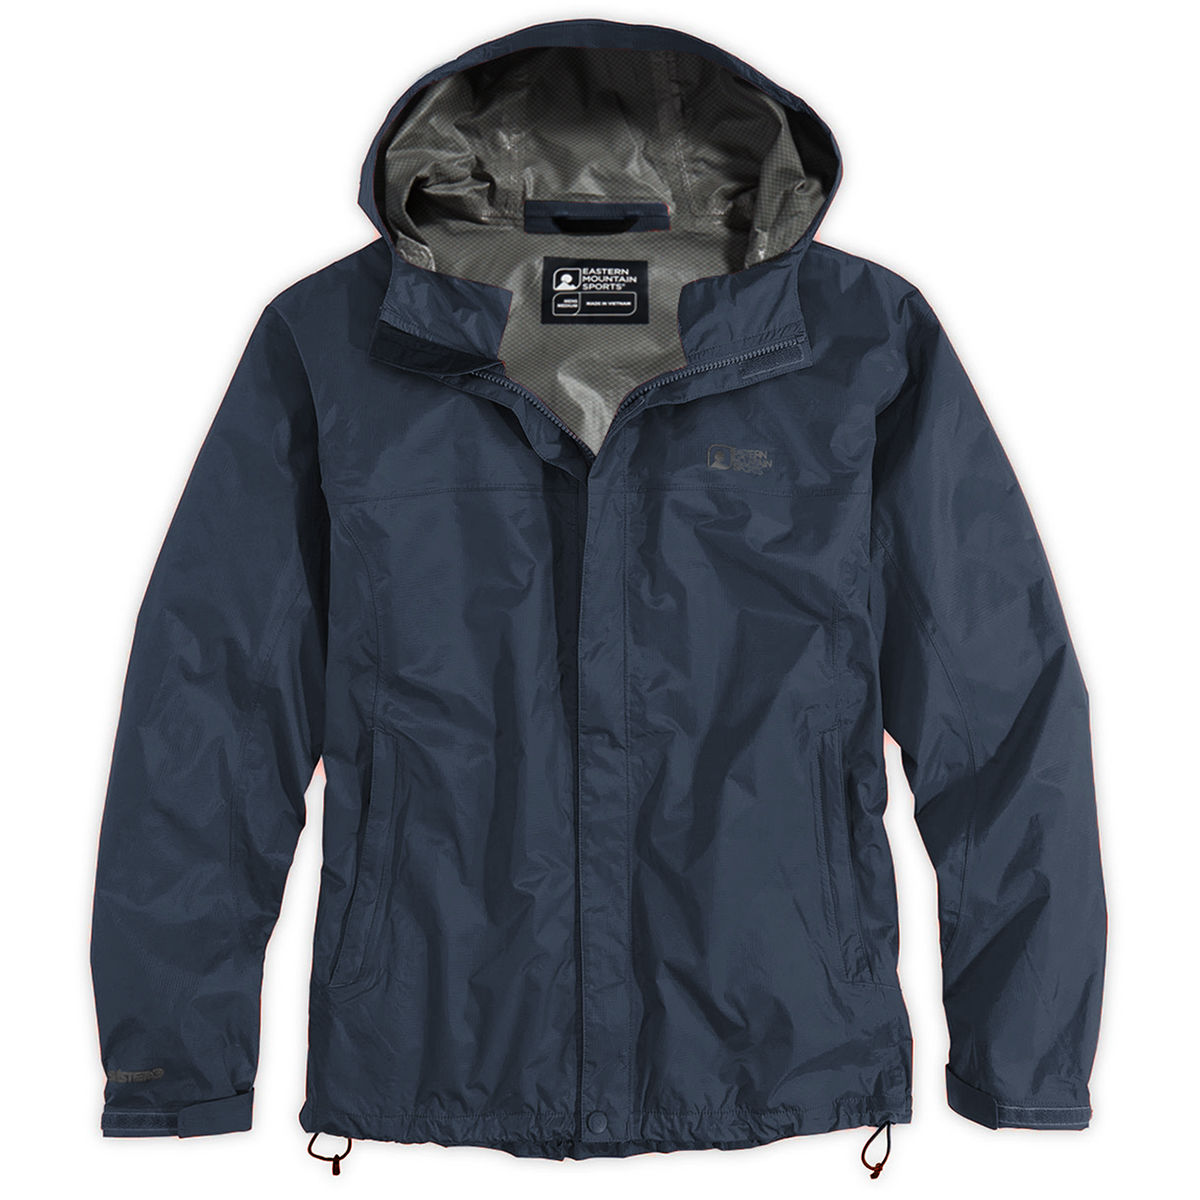 Ems Men's Thunderhead Jacket - Blue, L